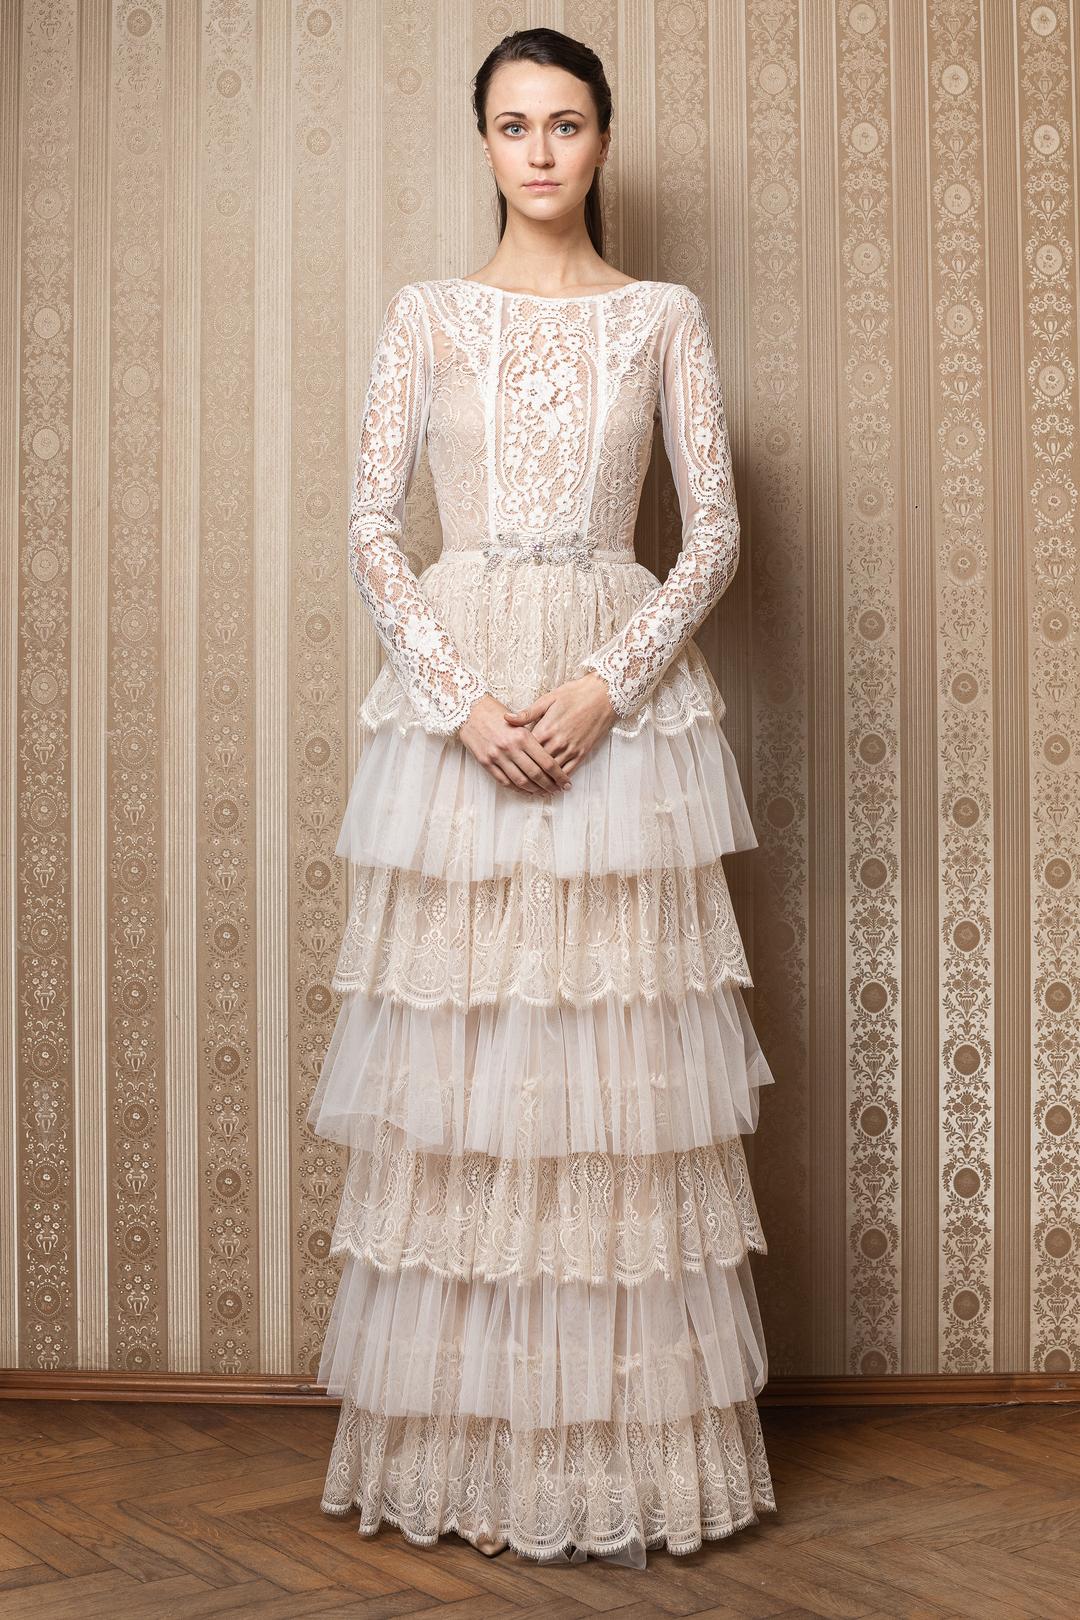 petal dress photo